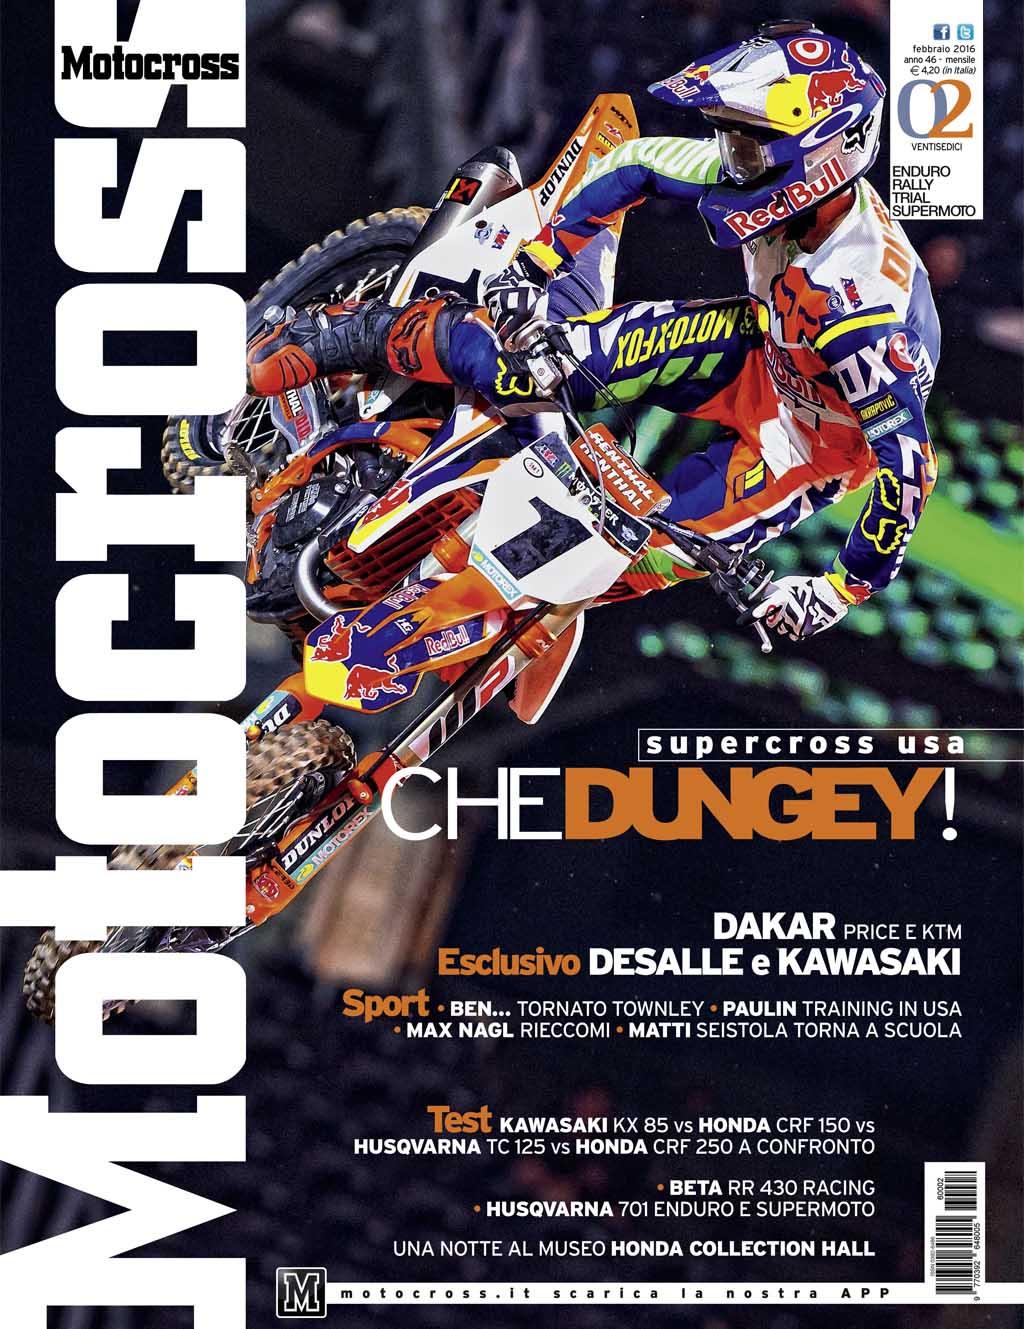 Motocross Febbraio 2016